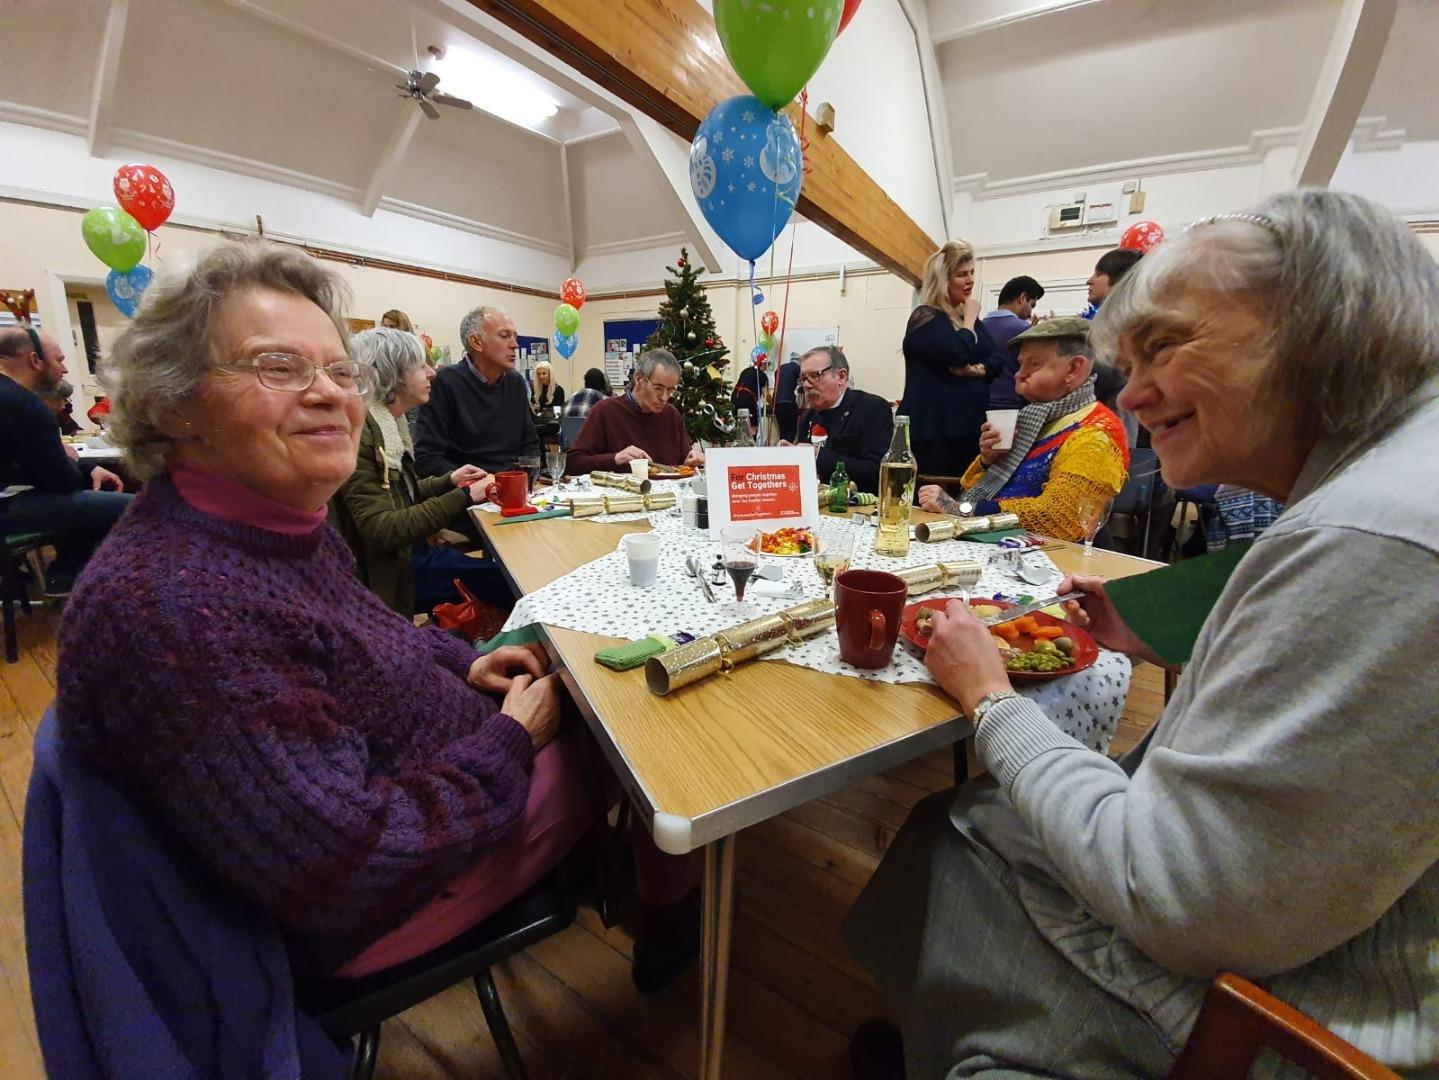 Festive lunch success for Stockport seniors